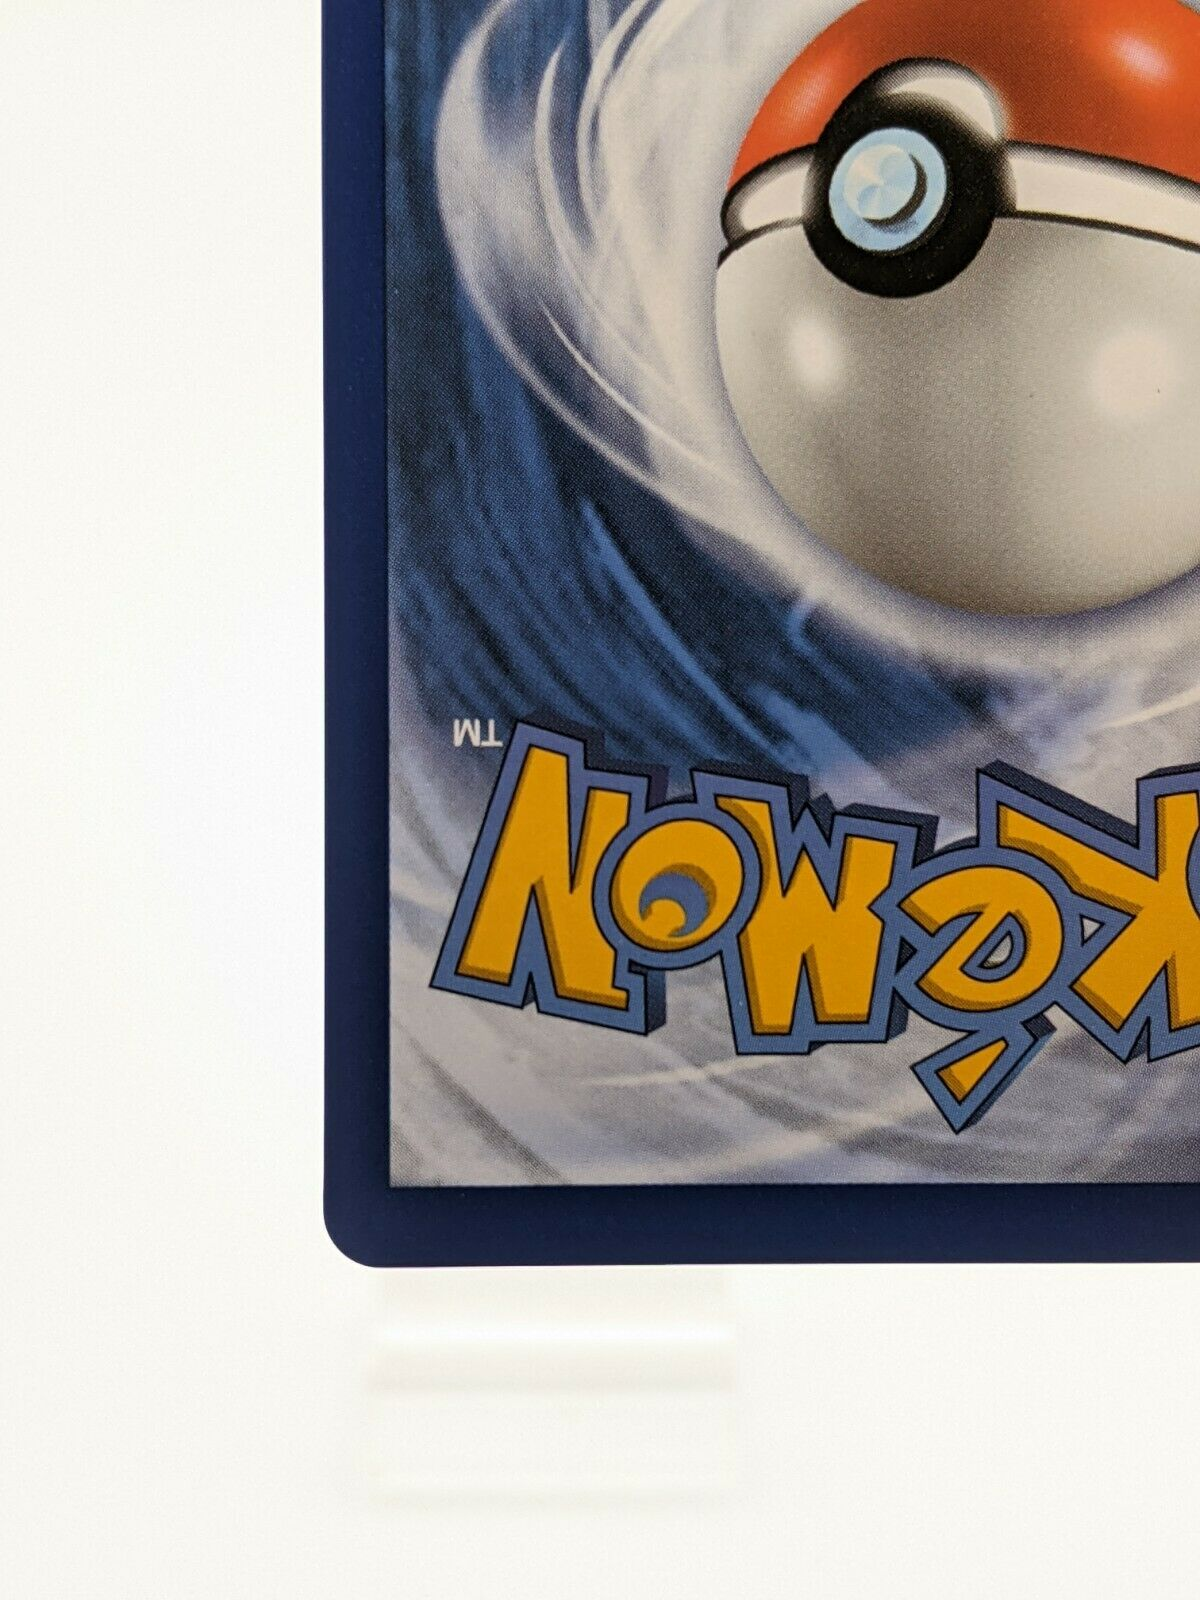 Water Energy 231/198 Chilling Reign Pokemon TCG Secret Rare NM - Image 9